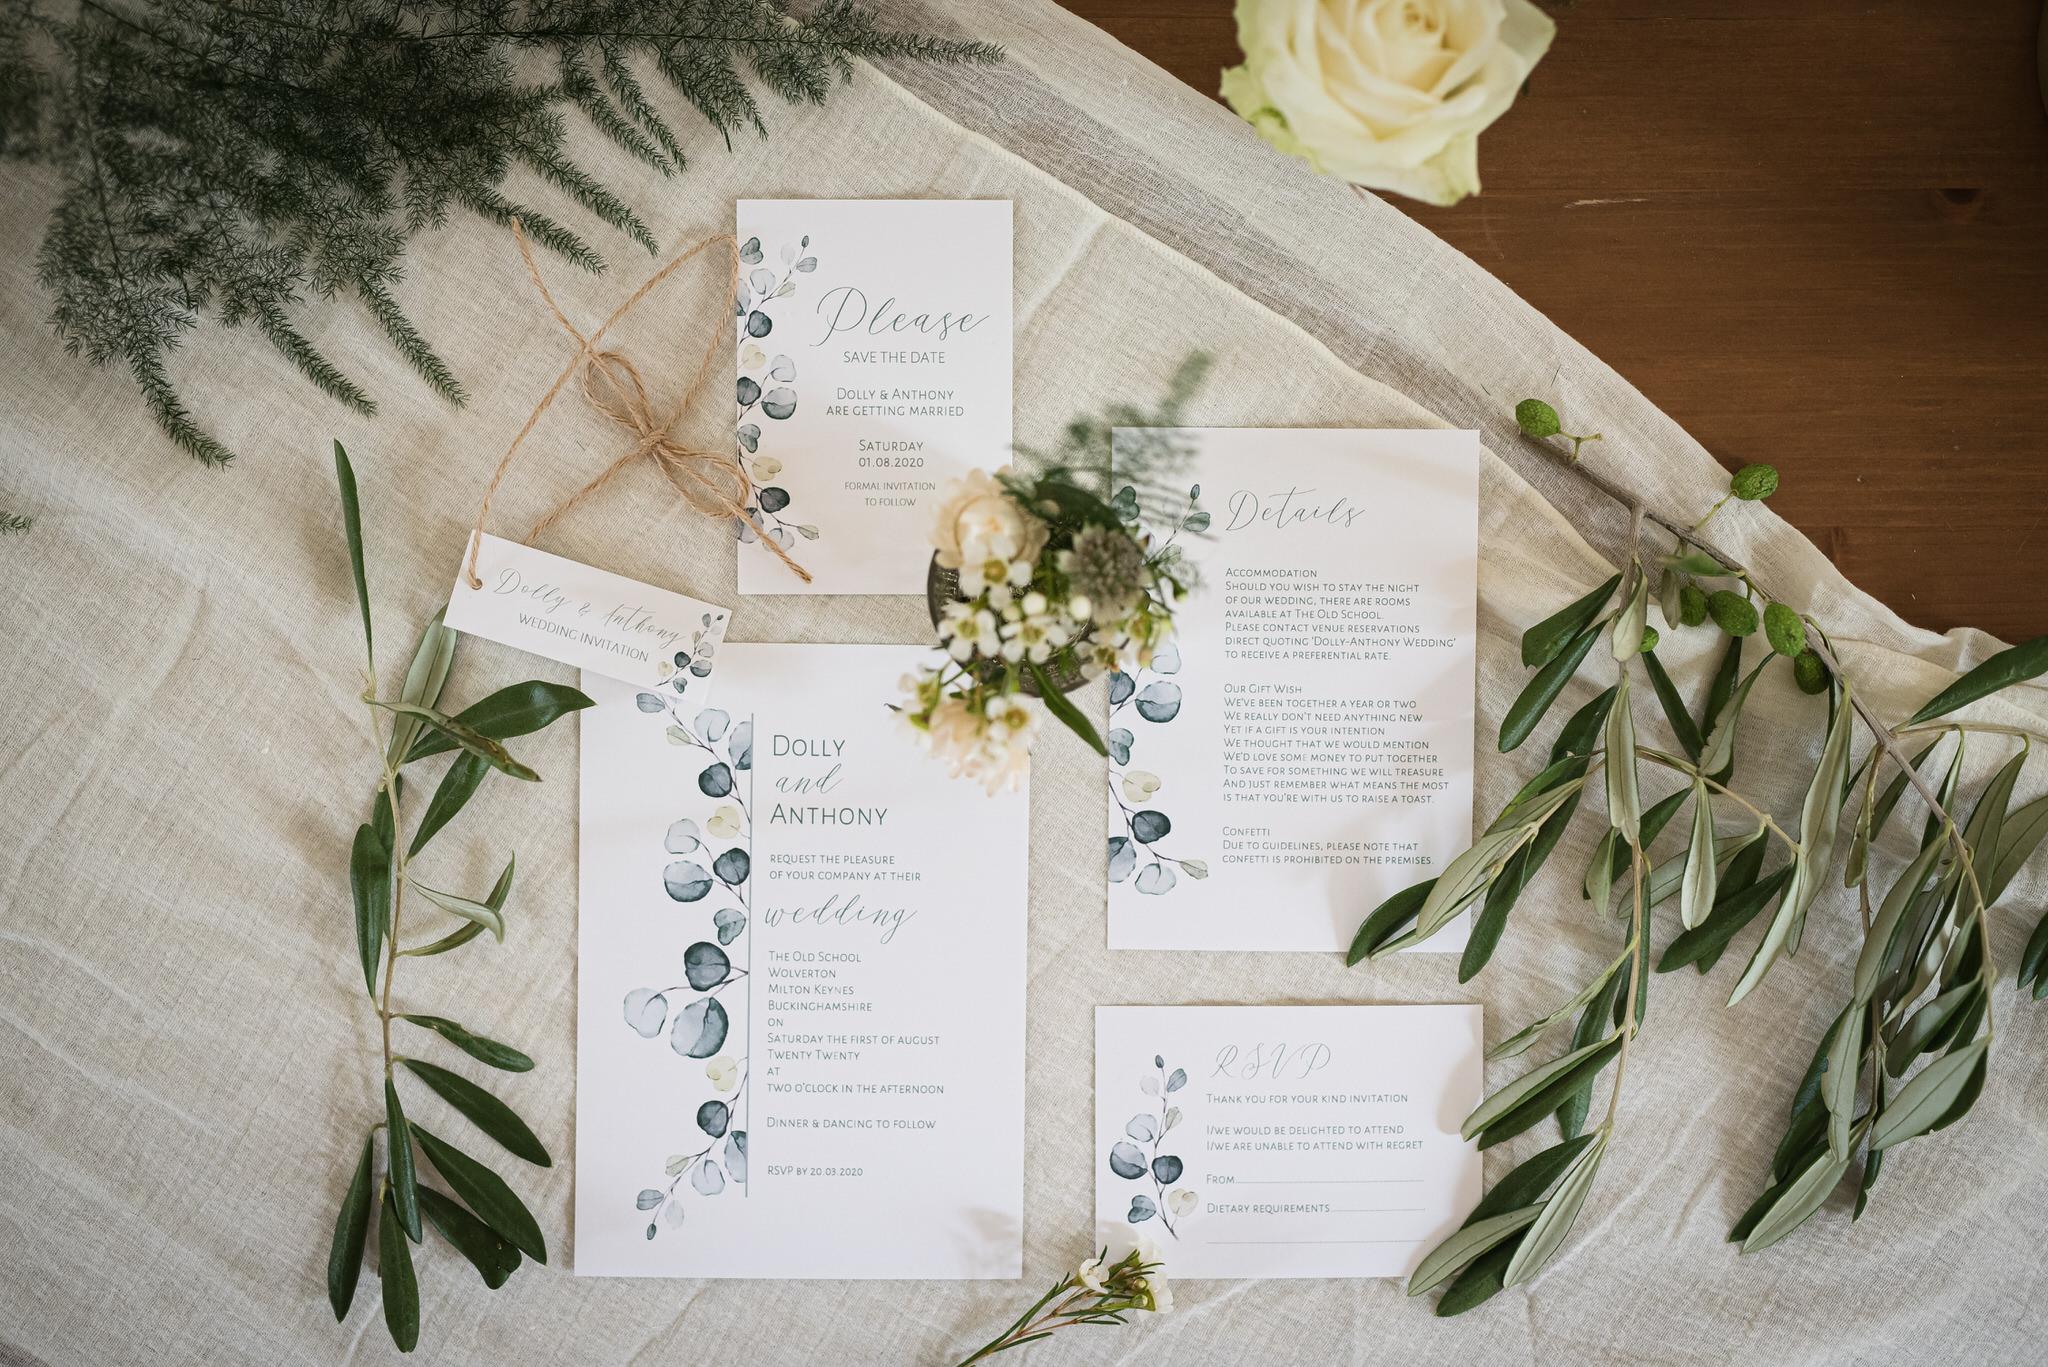 Luxury bespoke wedding invitations